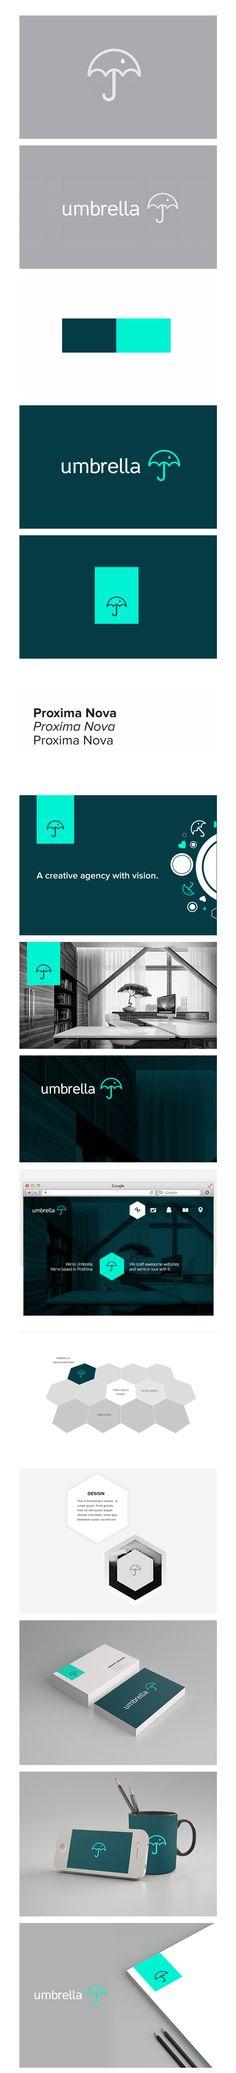 Umbrella / Arian Selimaj | #logo #corporatedesign #corporate-identity #identity #corporate #inspiration <<< repinned by www.BlickeDeeler.de | Follow us on #Facebook > www.facebook.com/BlickeDeeler.de